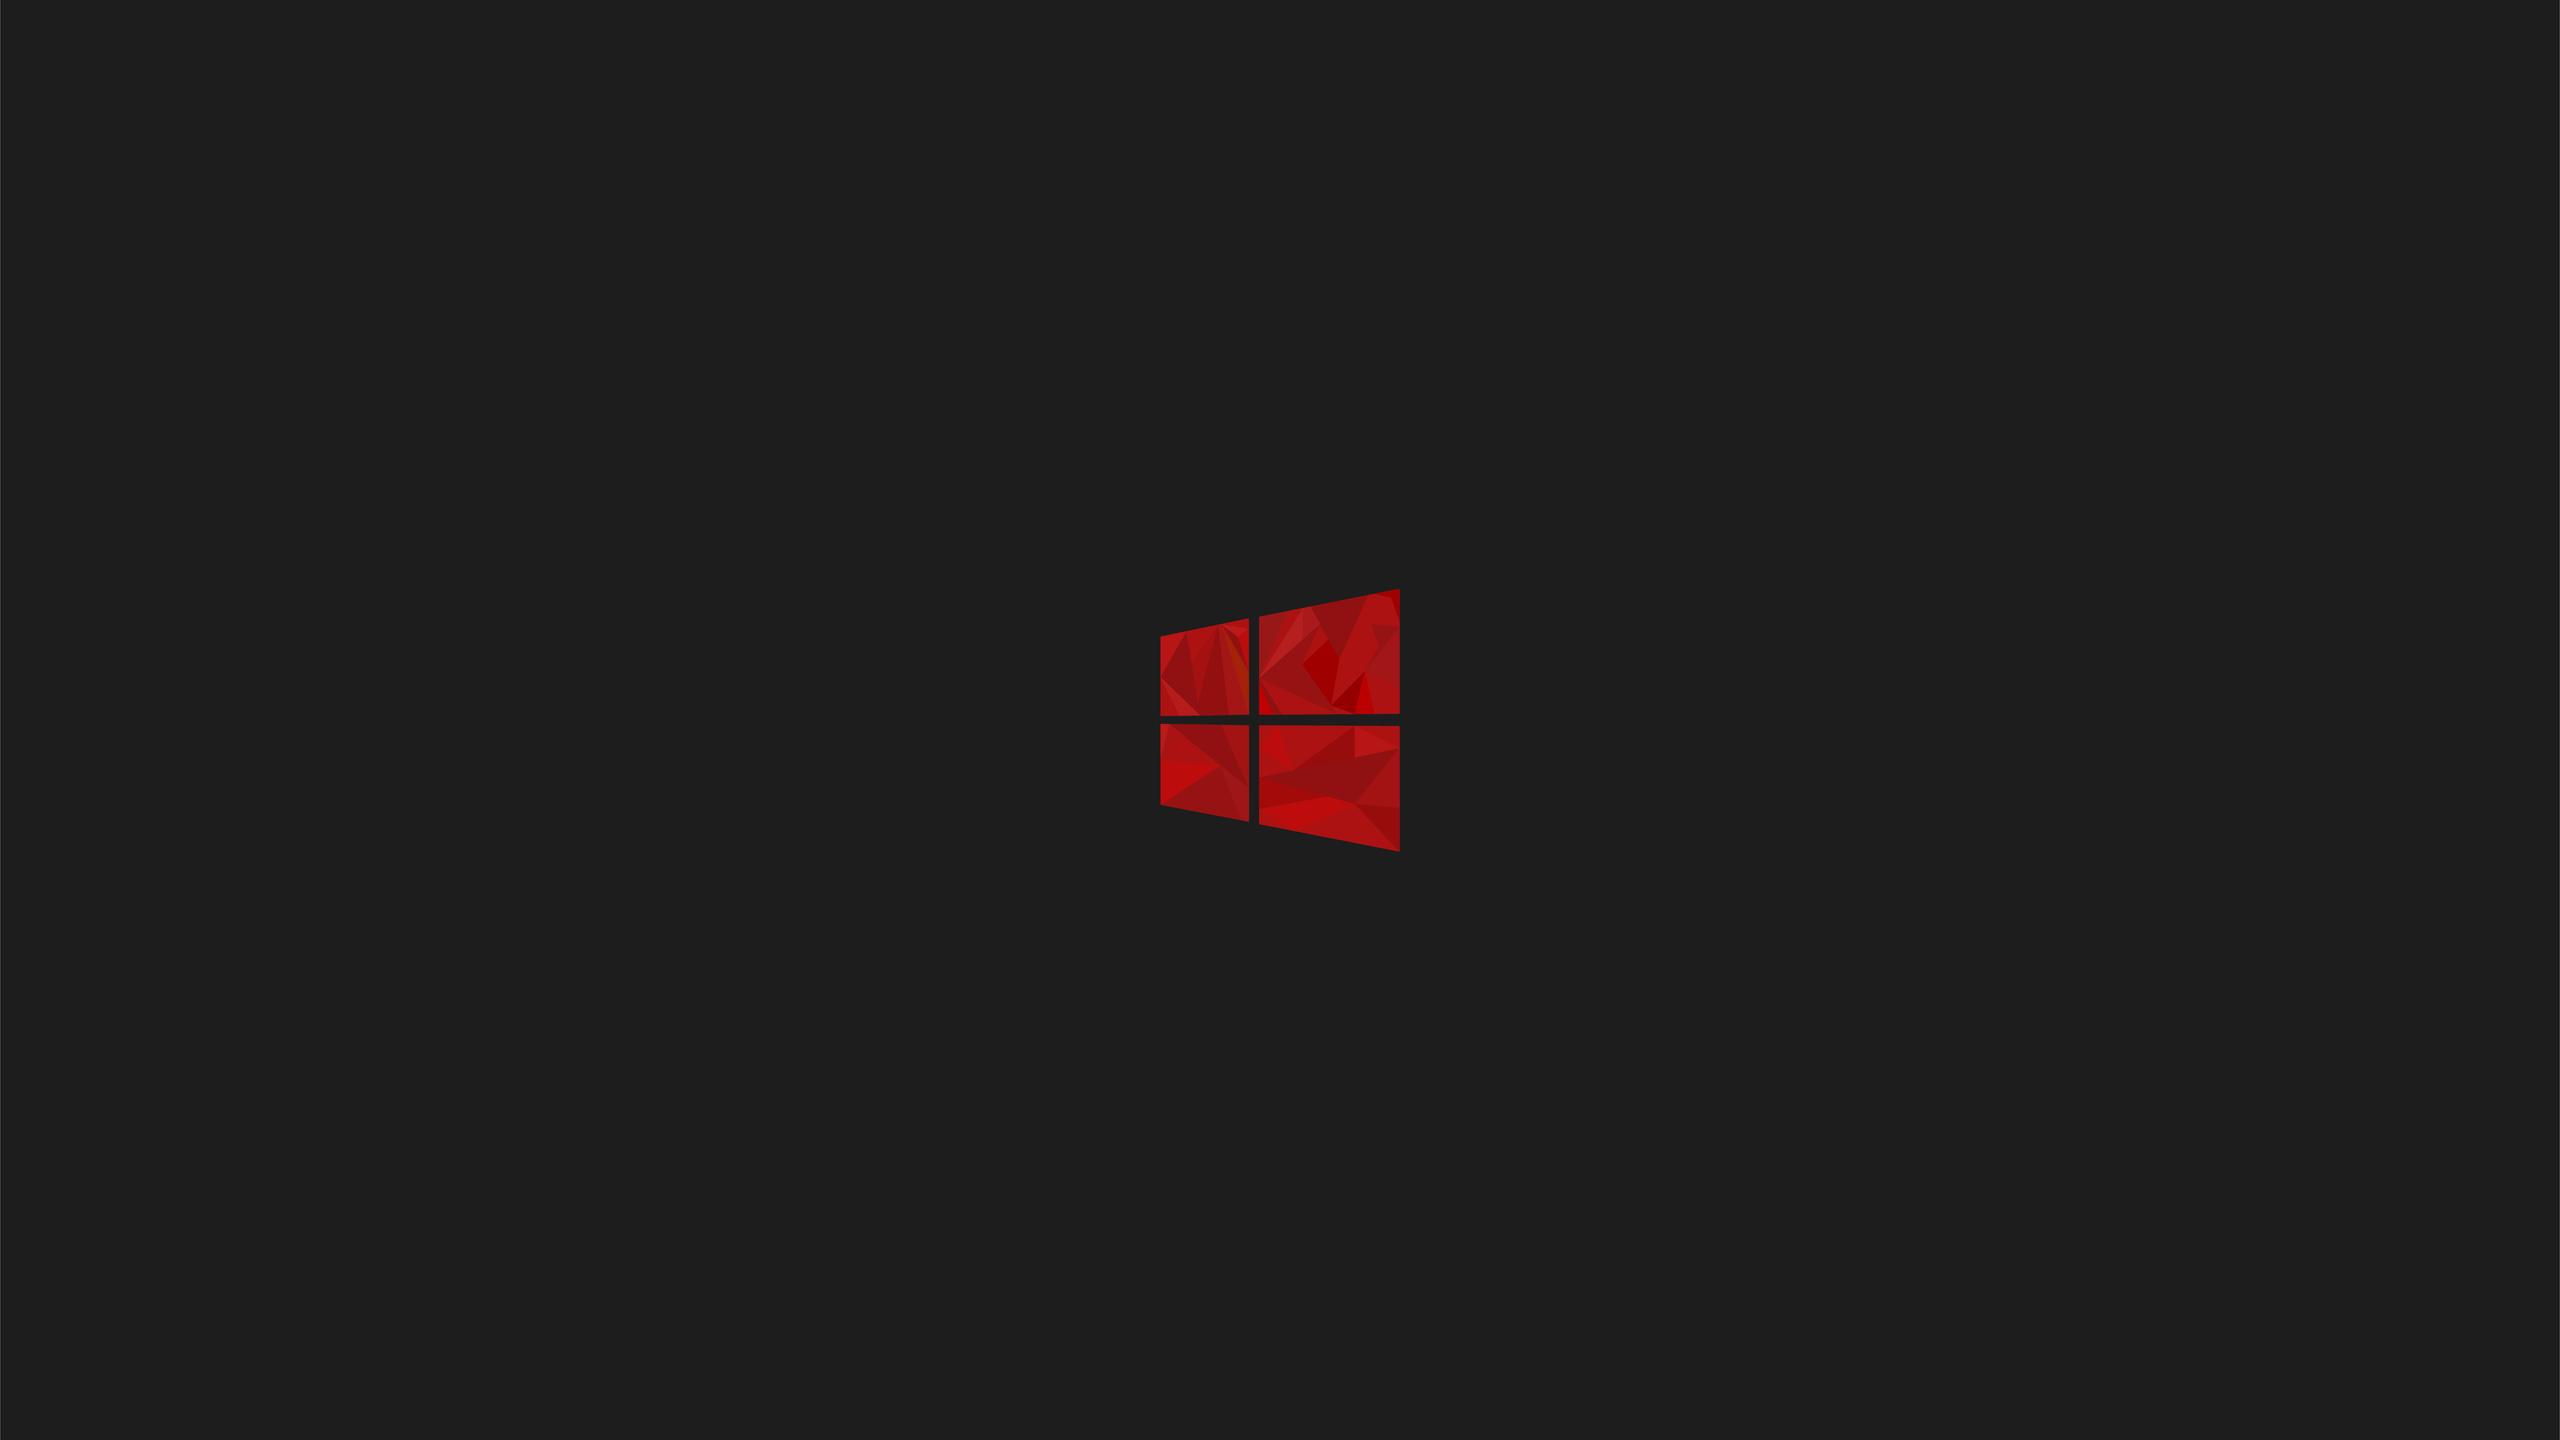 windows-10-red-minimal-simple-logo-8k-d2.jpg